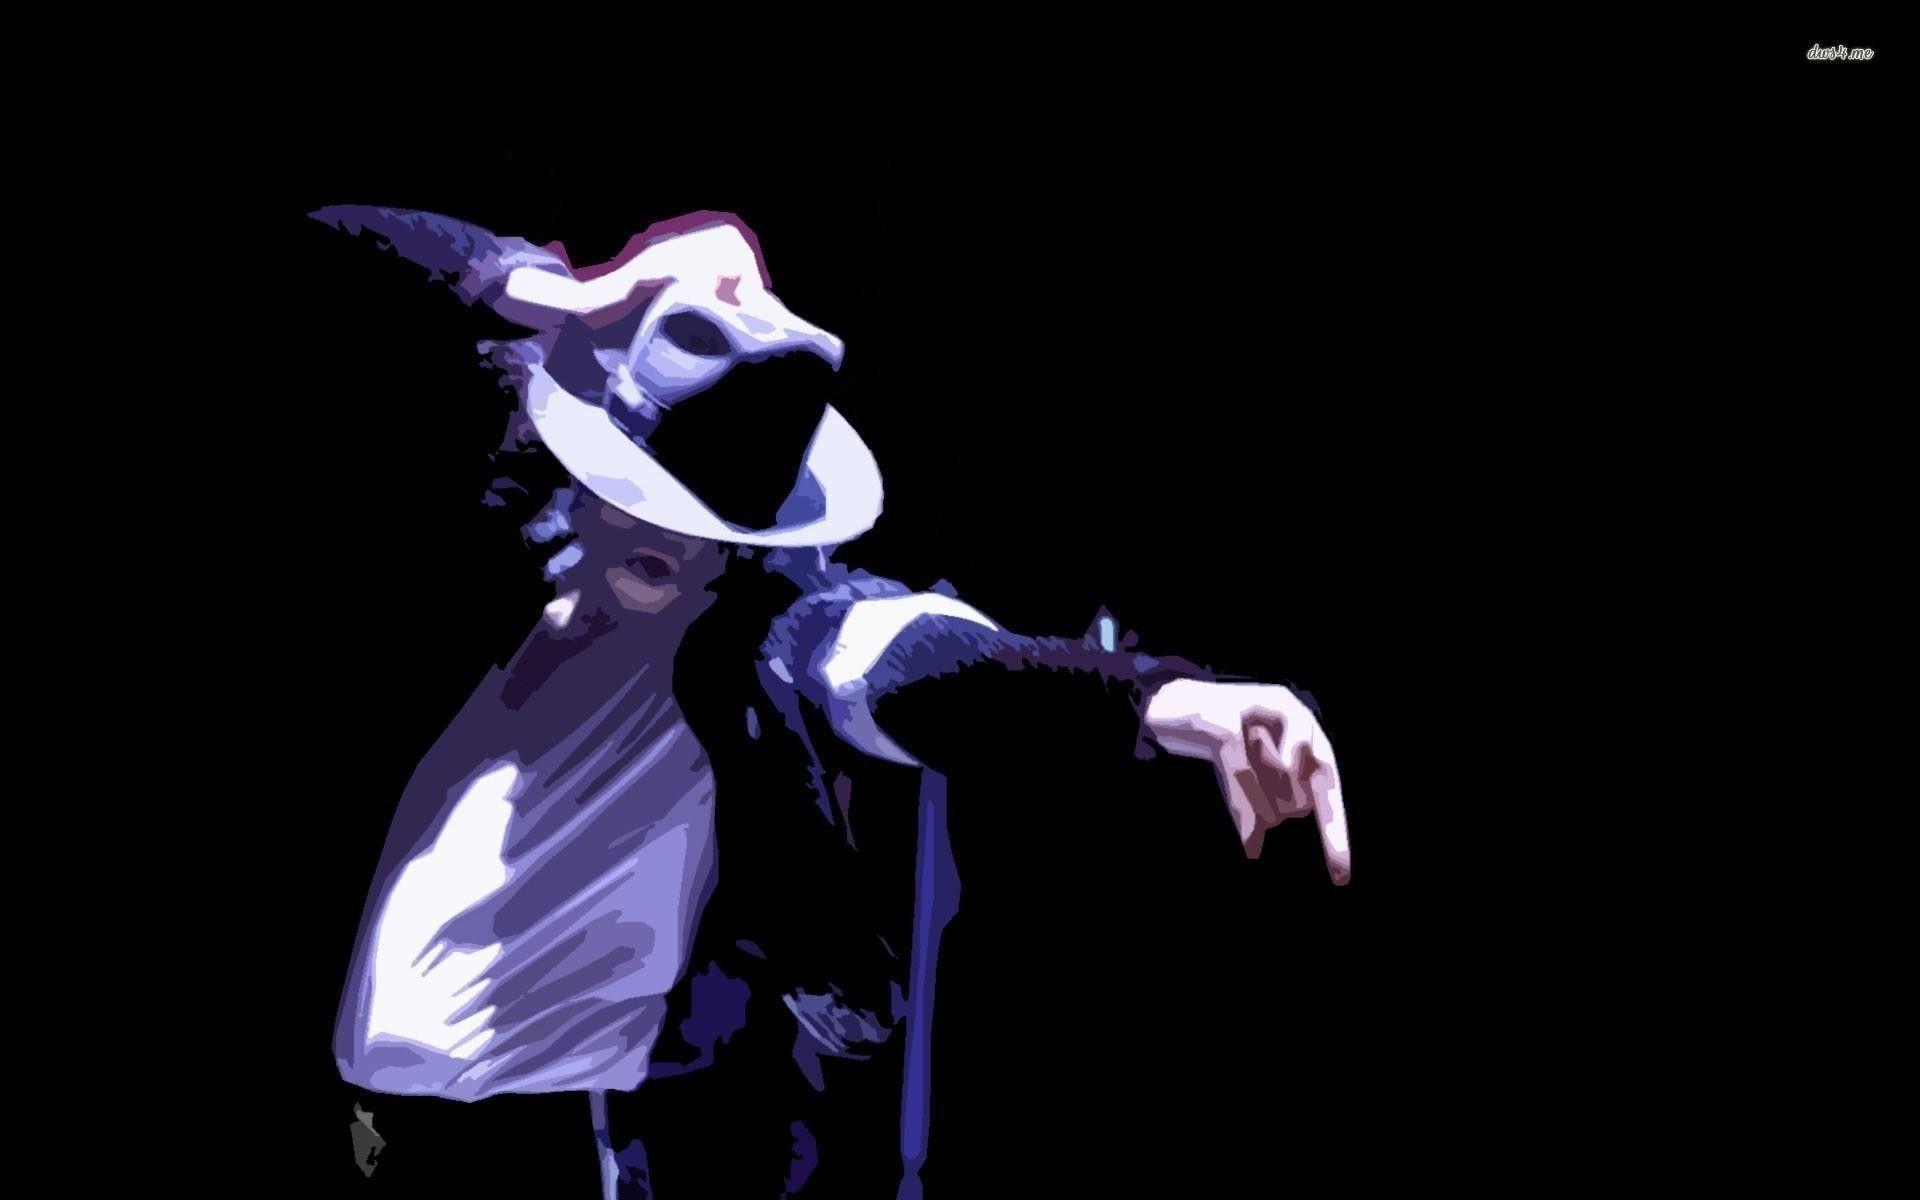 Michael Jackson Smooth Criminal Lean Wallpapers Wallpaper Cave